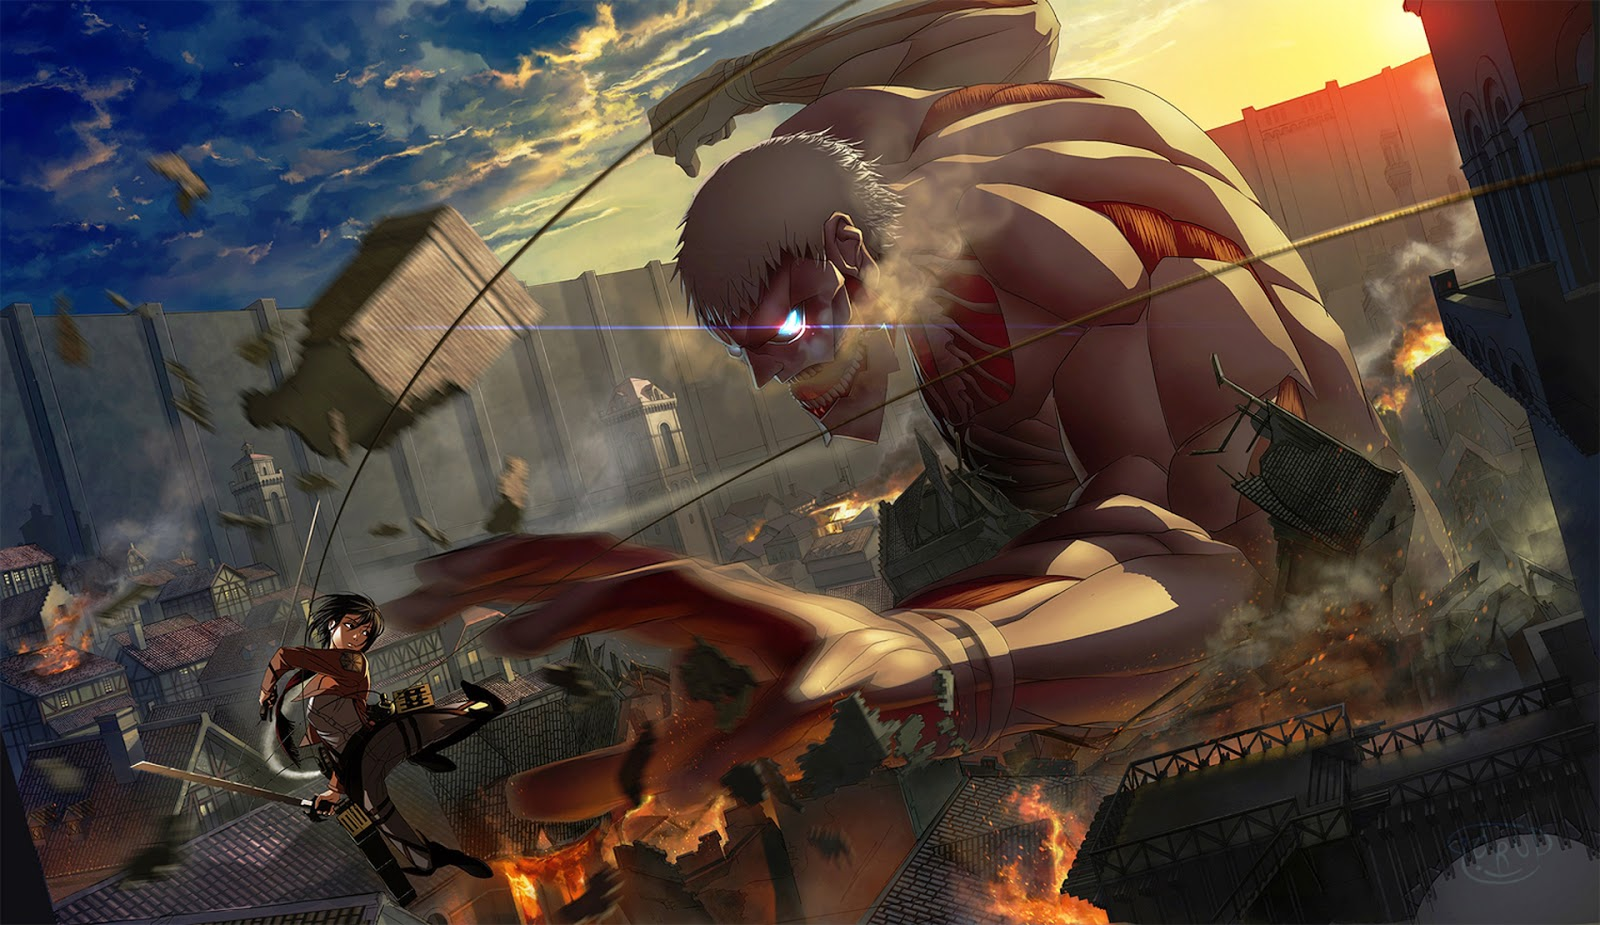 AOT Wallpapers shingeki no kyojin attack on titan 36001011 1600 925 1600x925